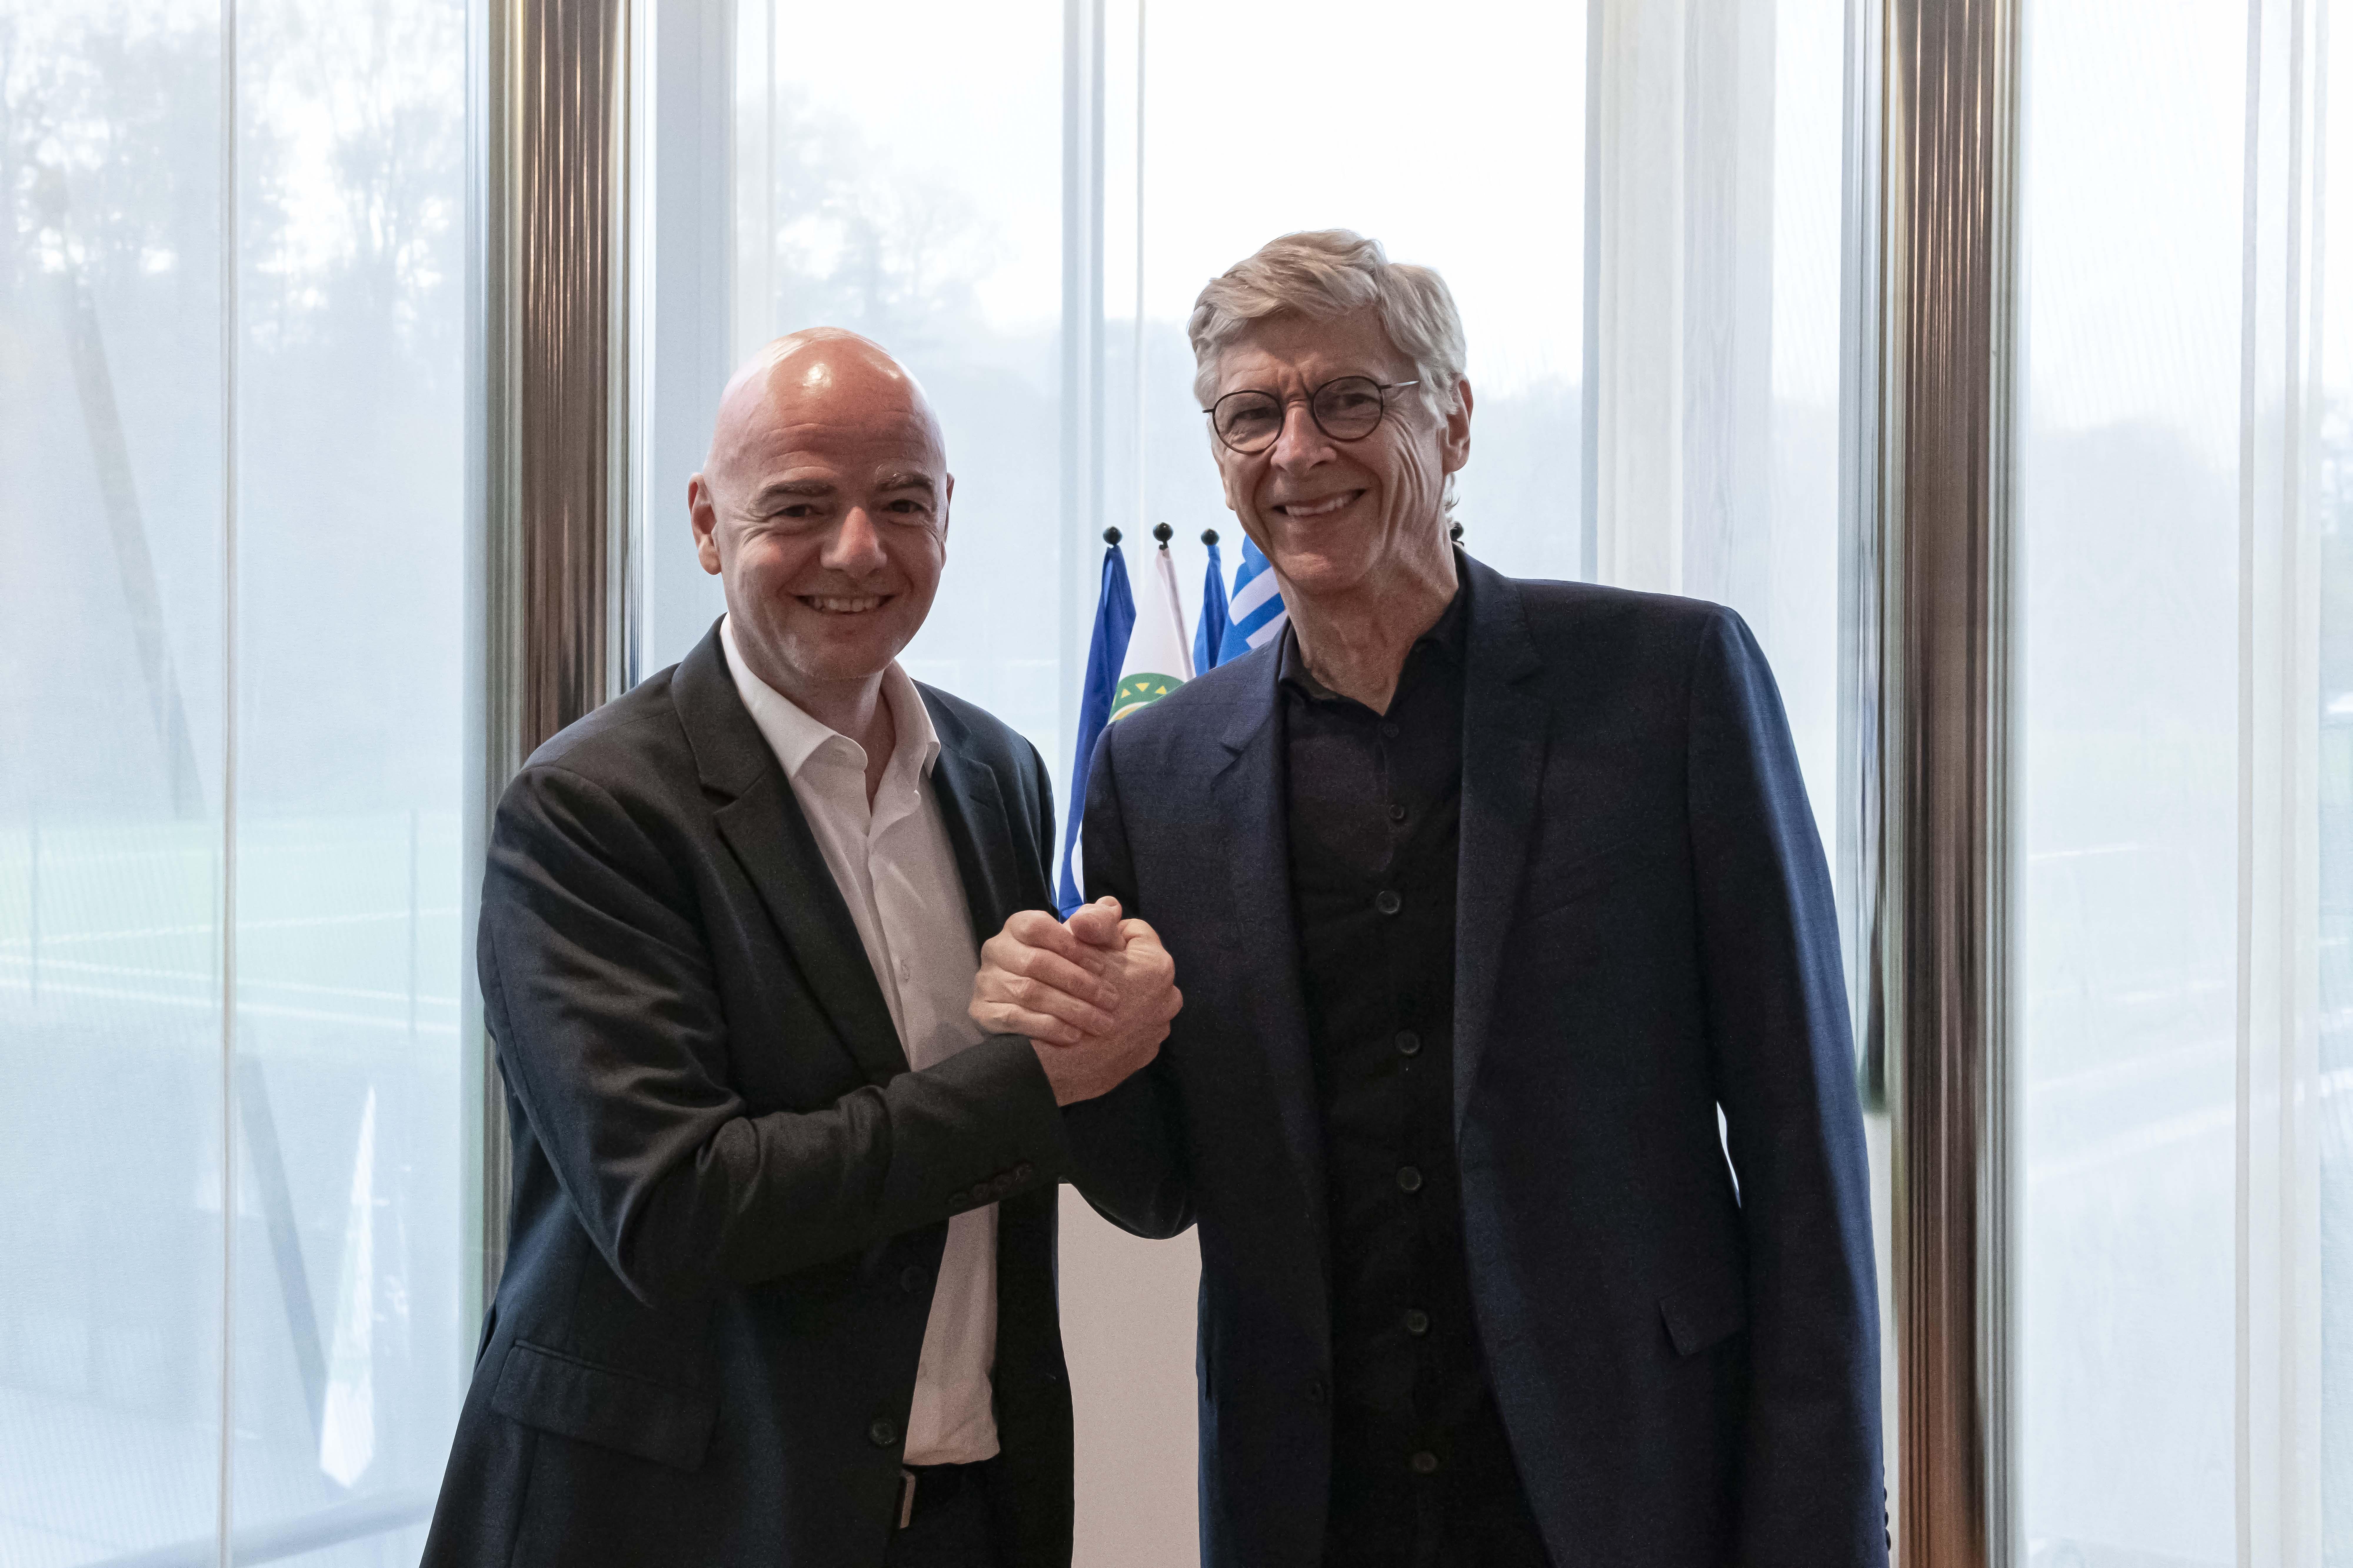 Arsene Wenger (r) with FIFA president Gianni Infantino